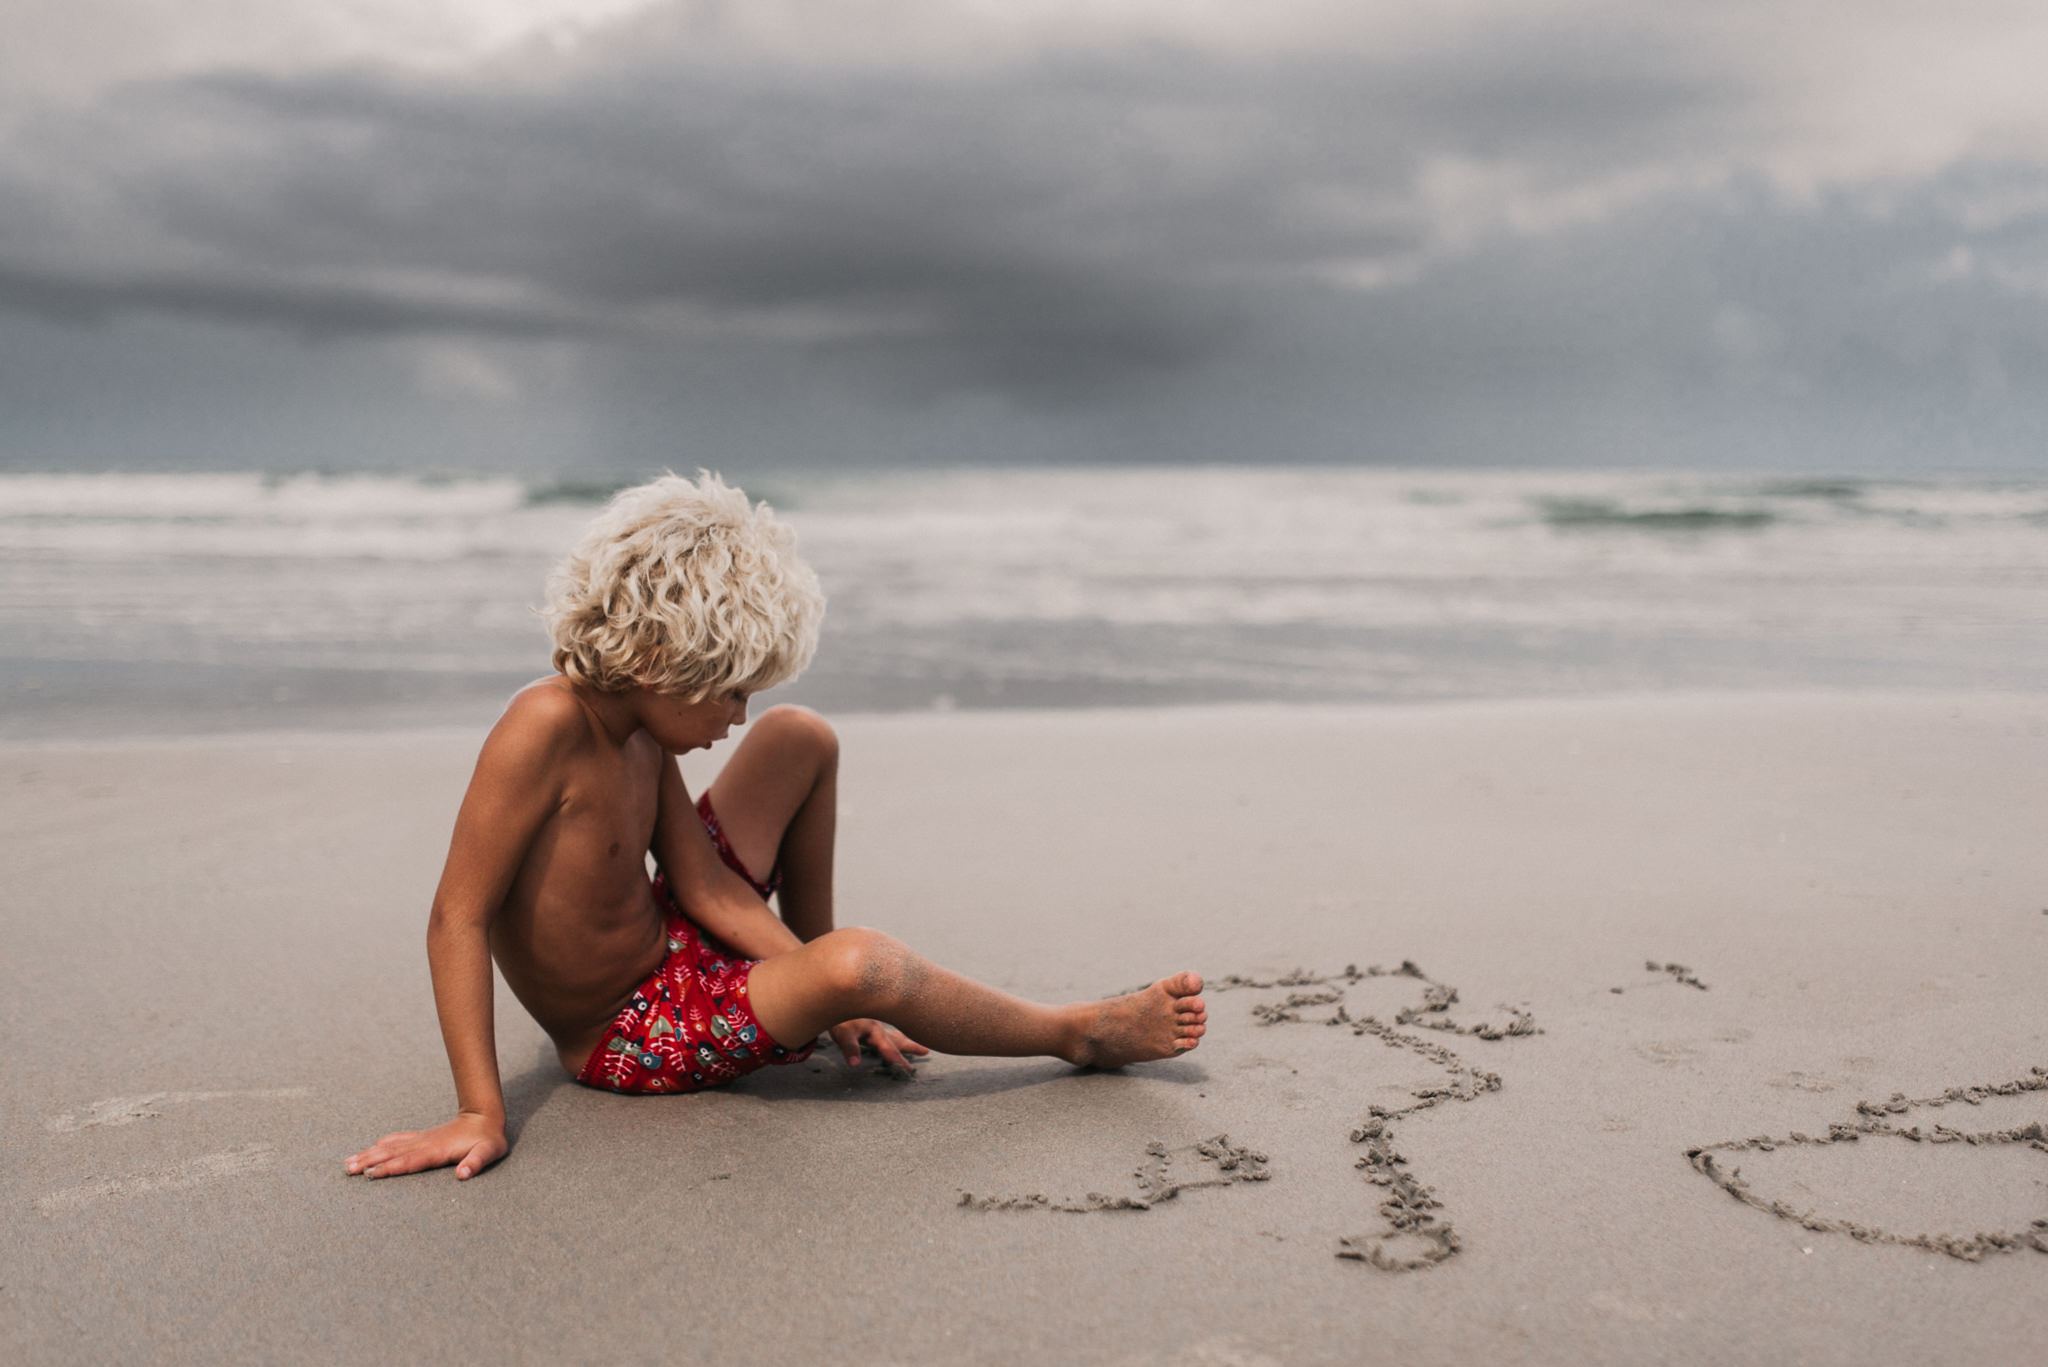 twyla jones photography - treasure coast florida - stormy beach boy playing in sand--13.jpg